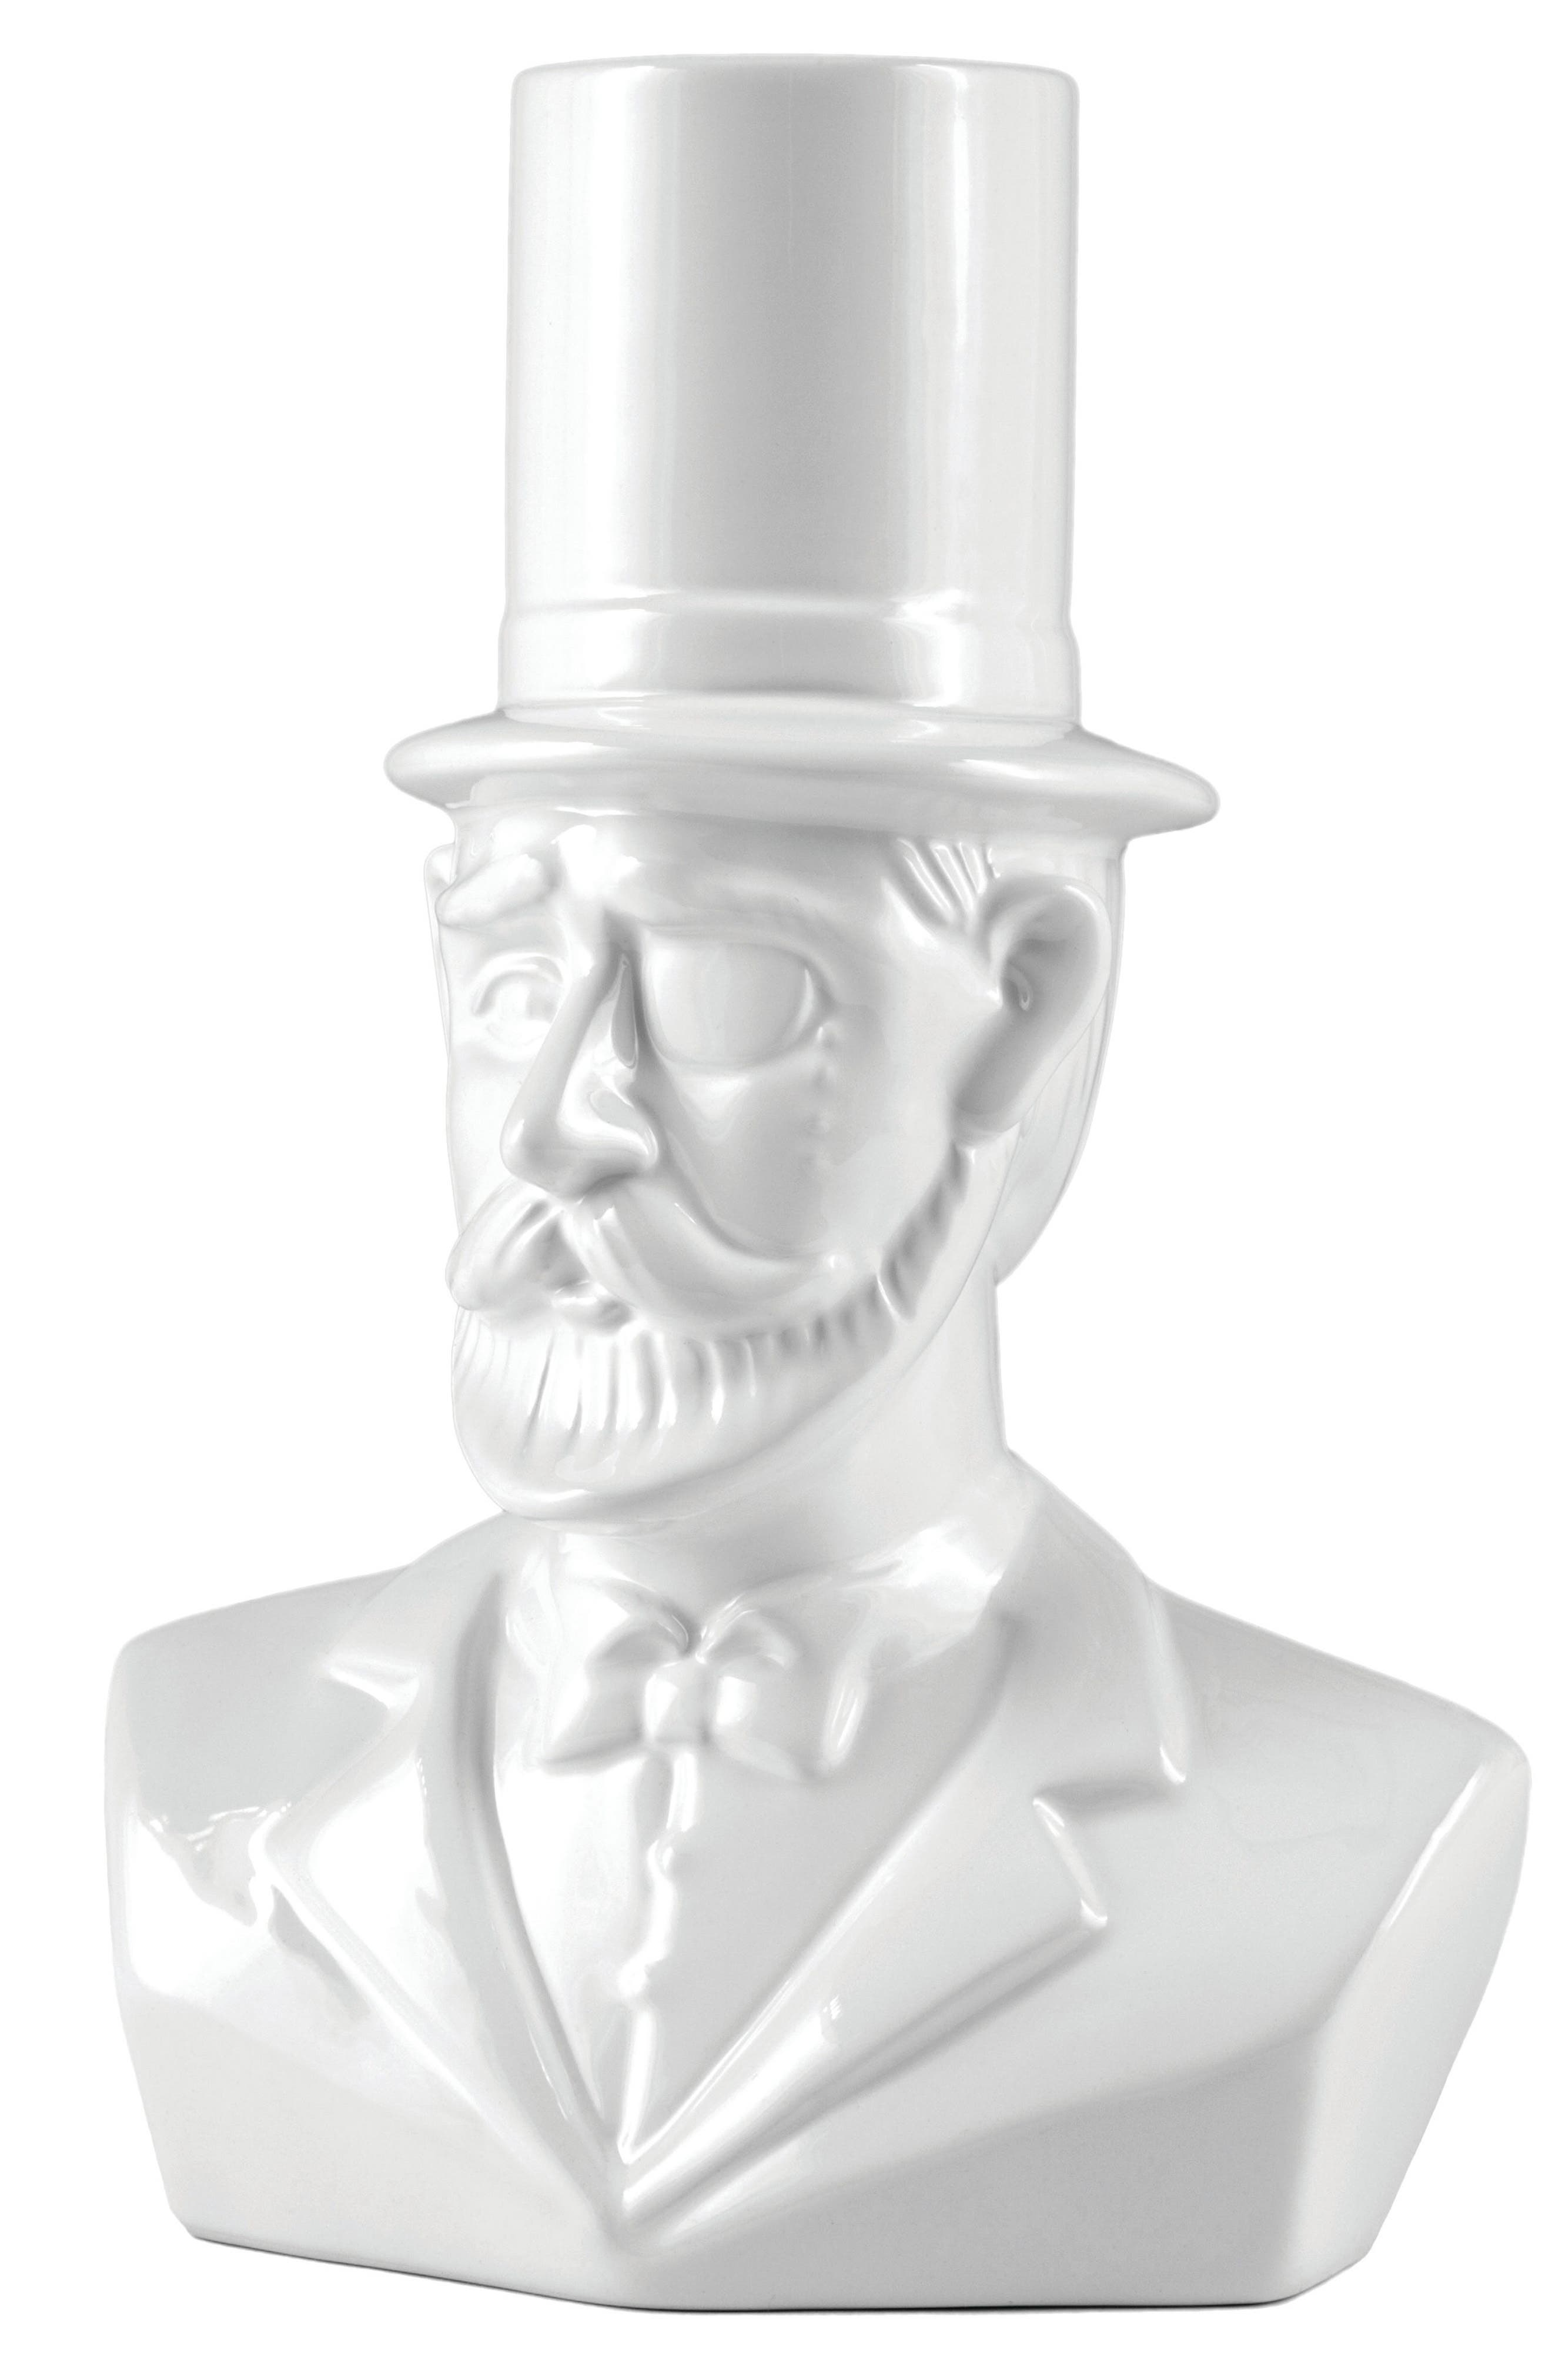 Gentleman Planter,                         Main,                         color, White